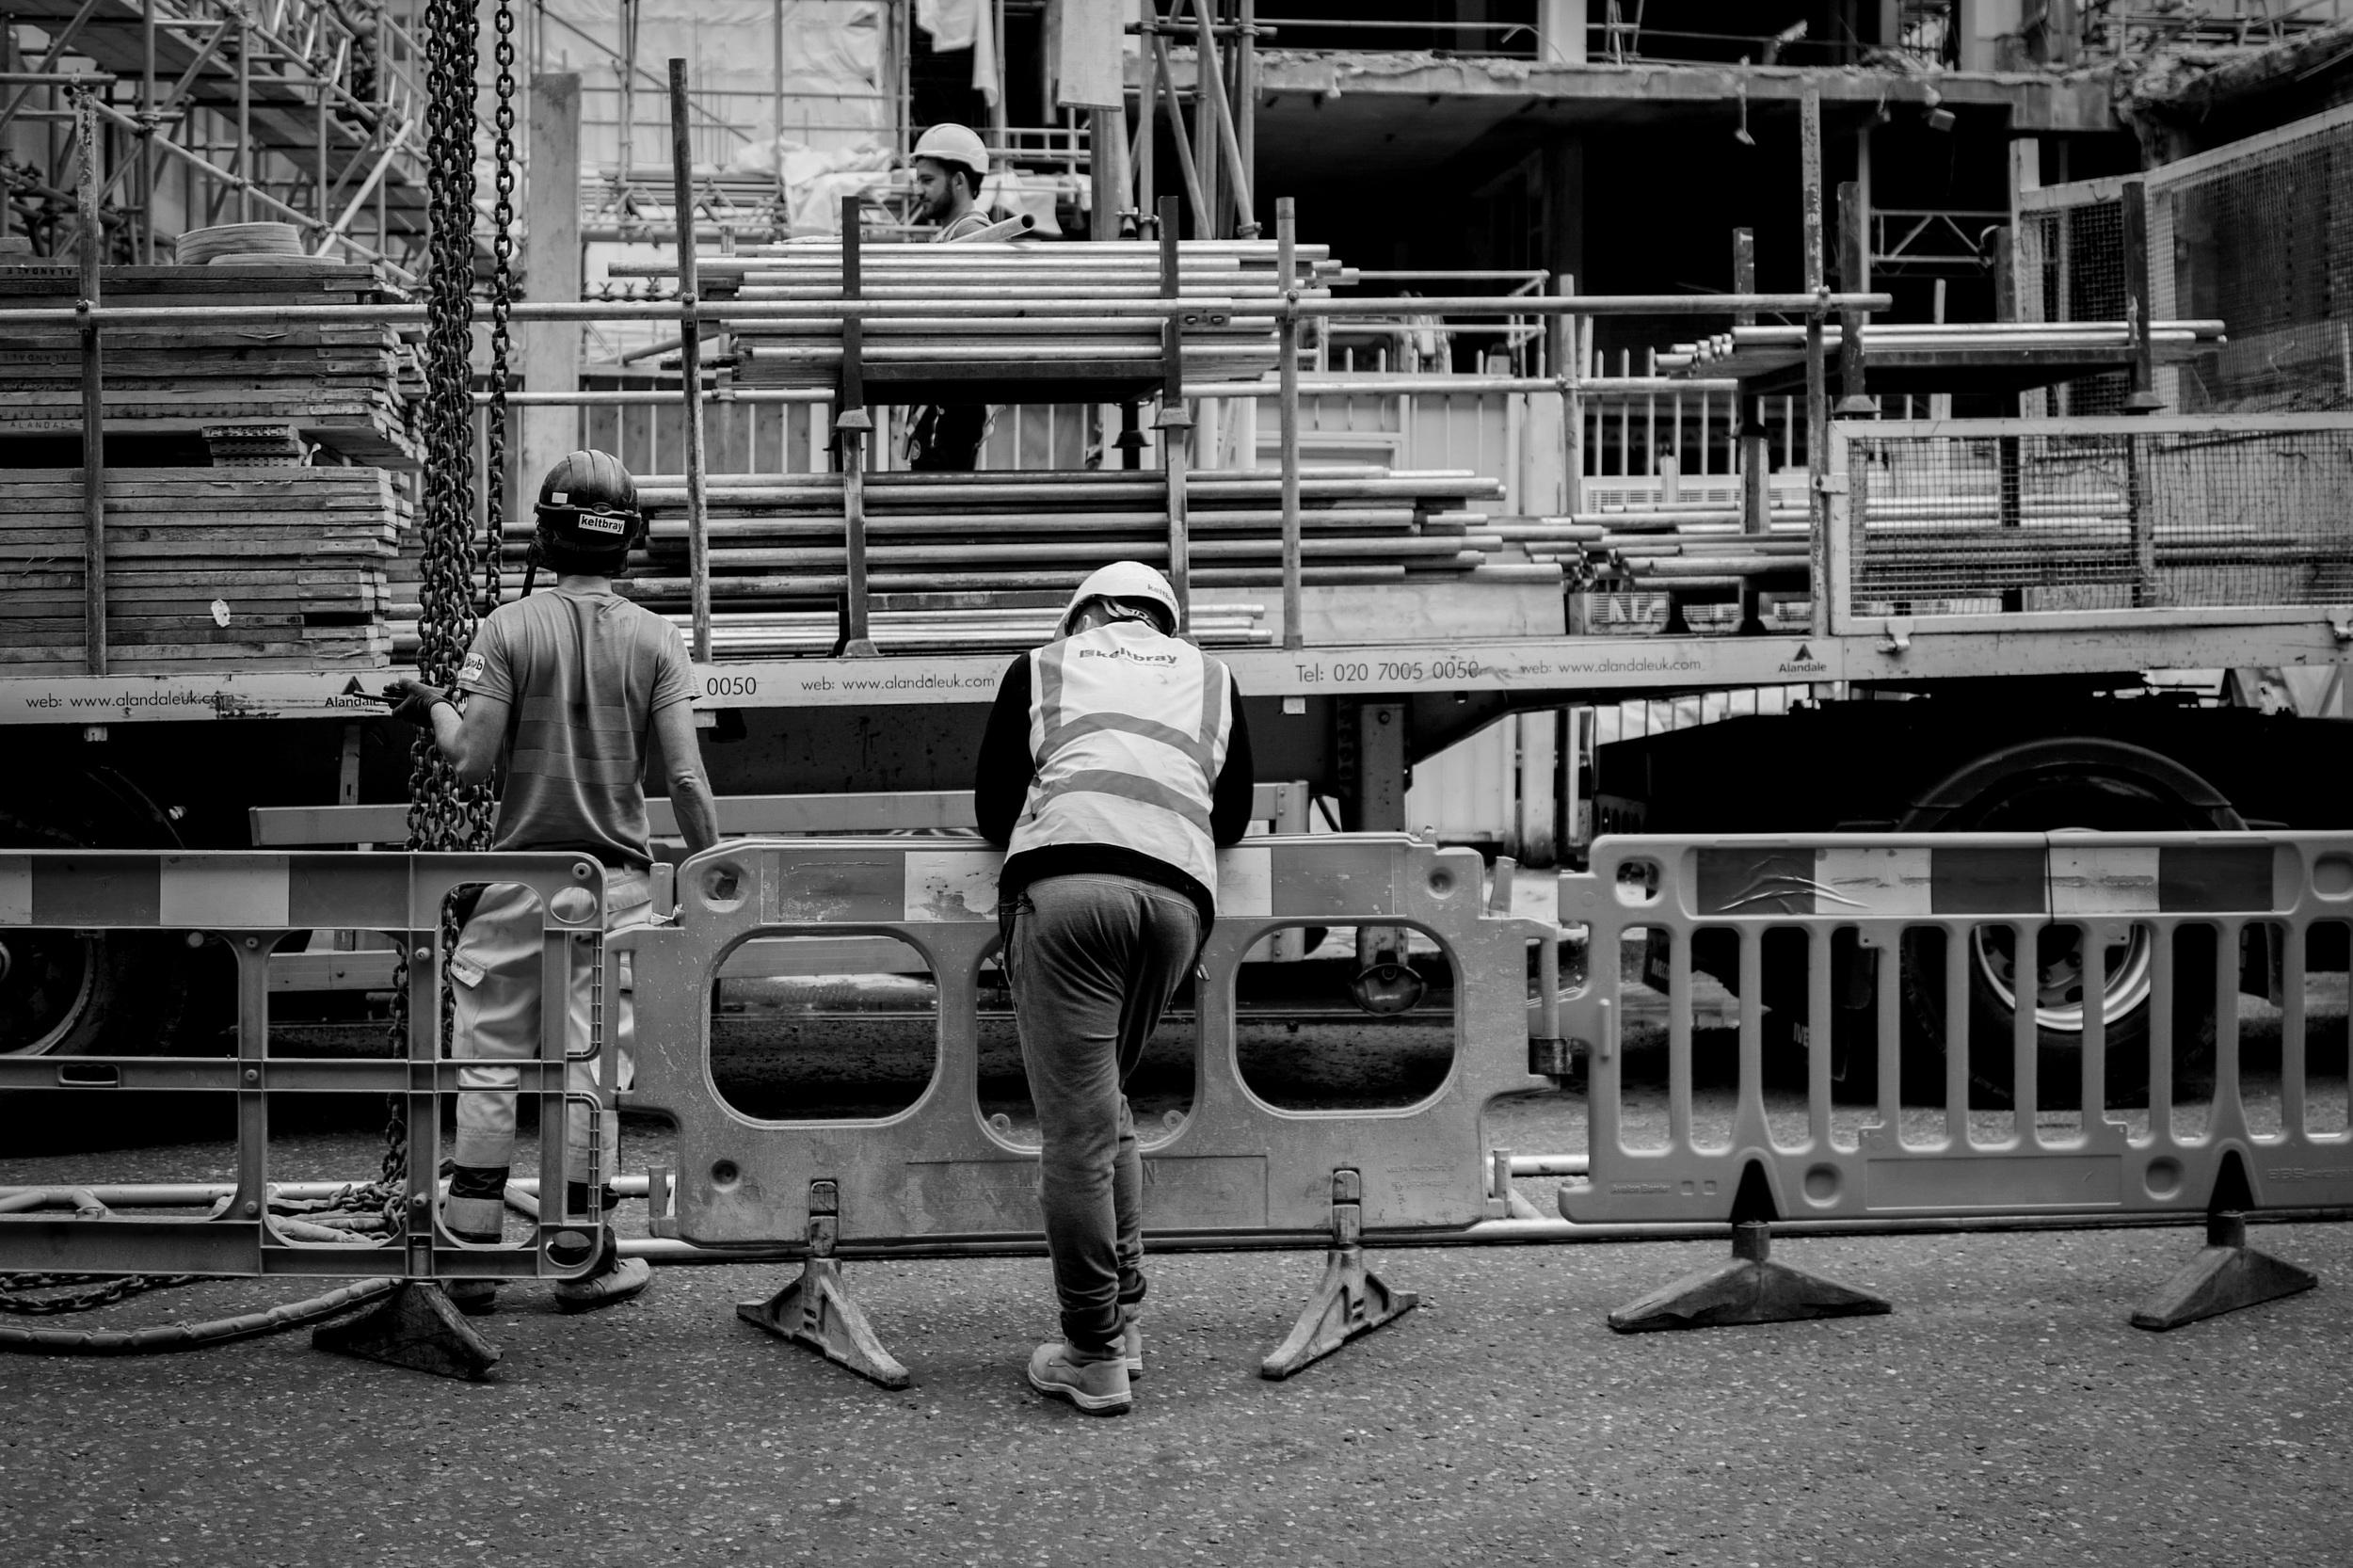 """Supervisor"" - Leica Q at Moorgate, London"